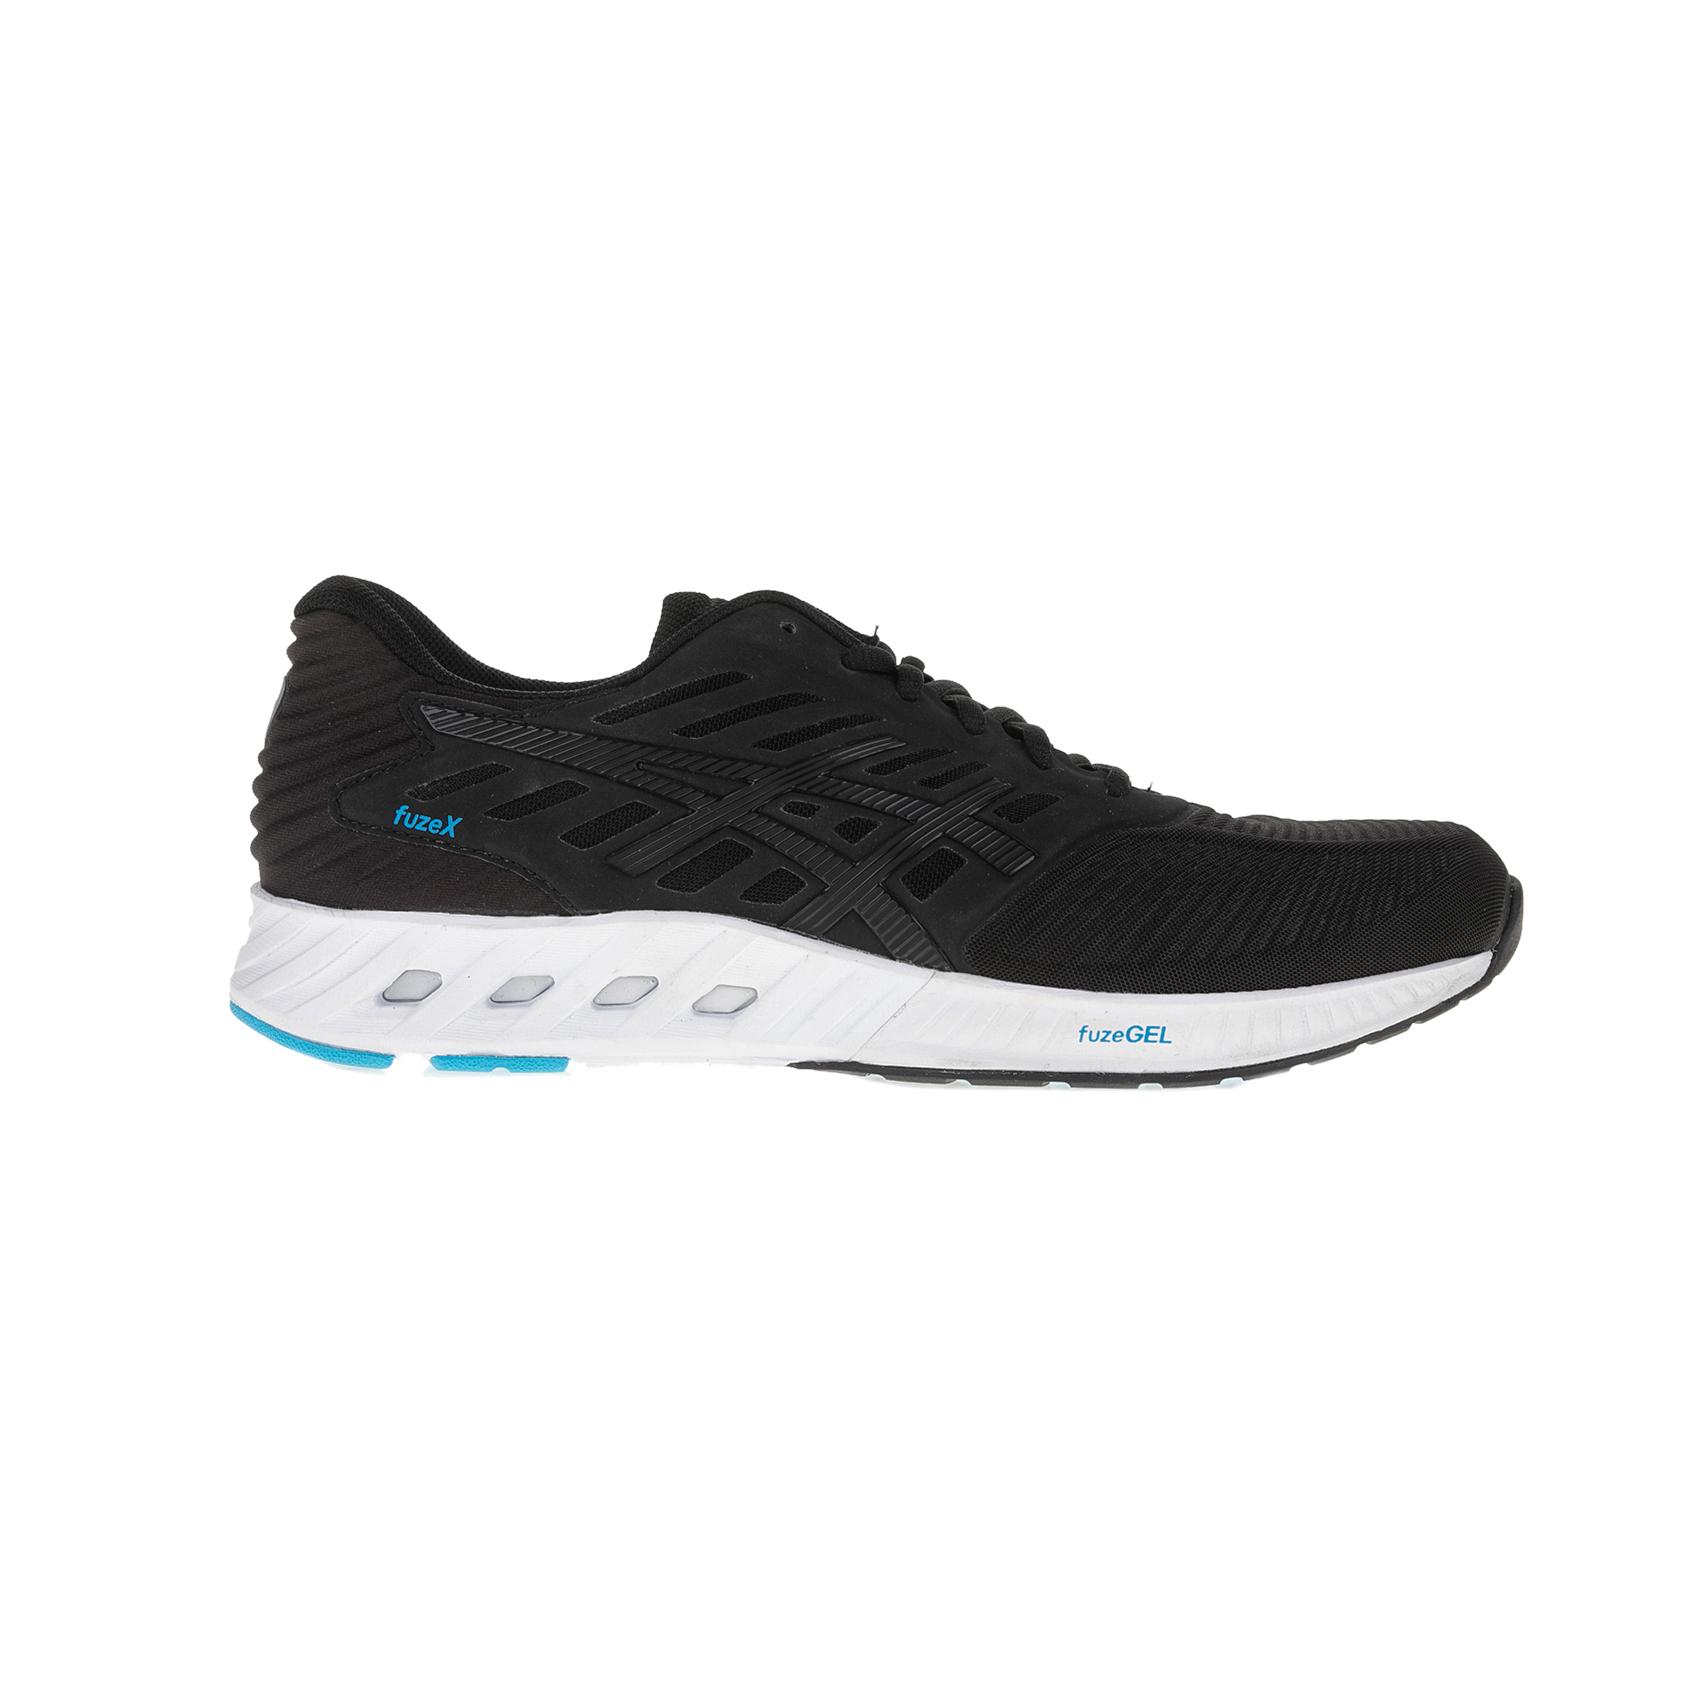 fb58f0479d8 Ανδρικά Αθλητικά Παπούτσια για Τρέξιμο | e-Papoutsia.gr